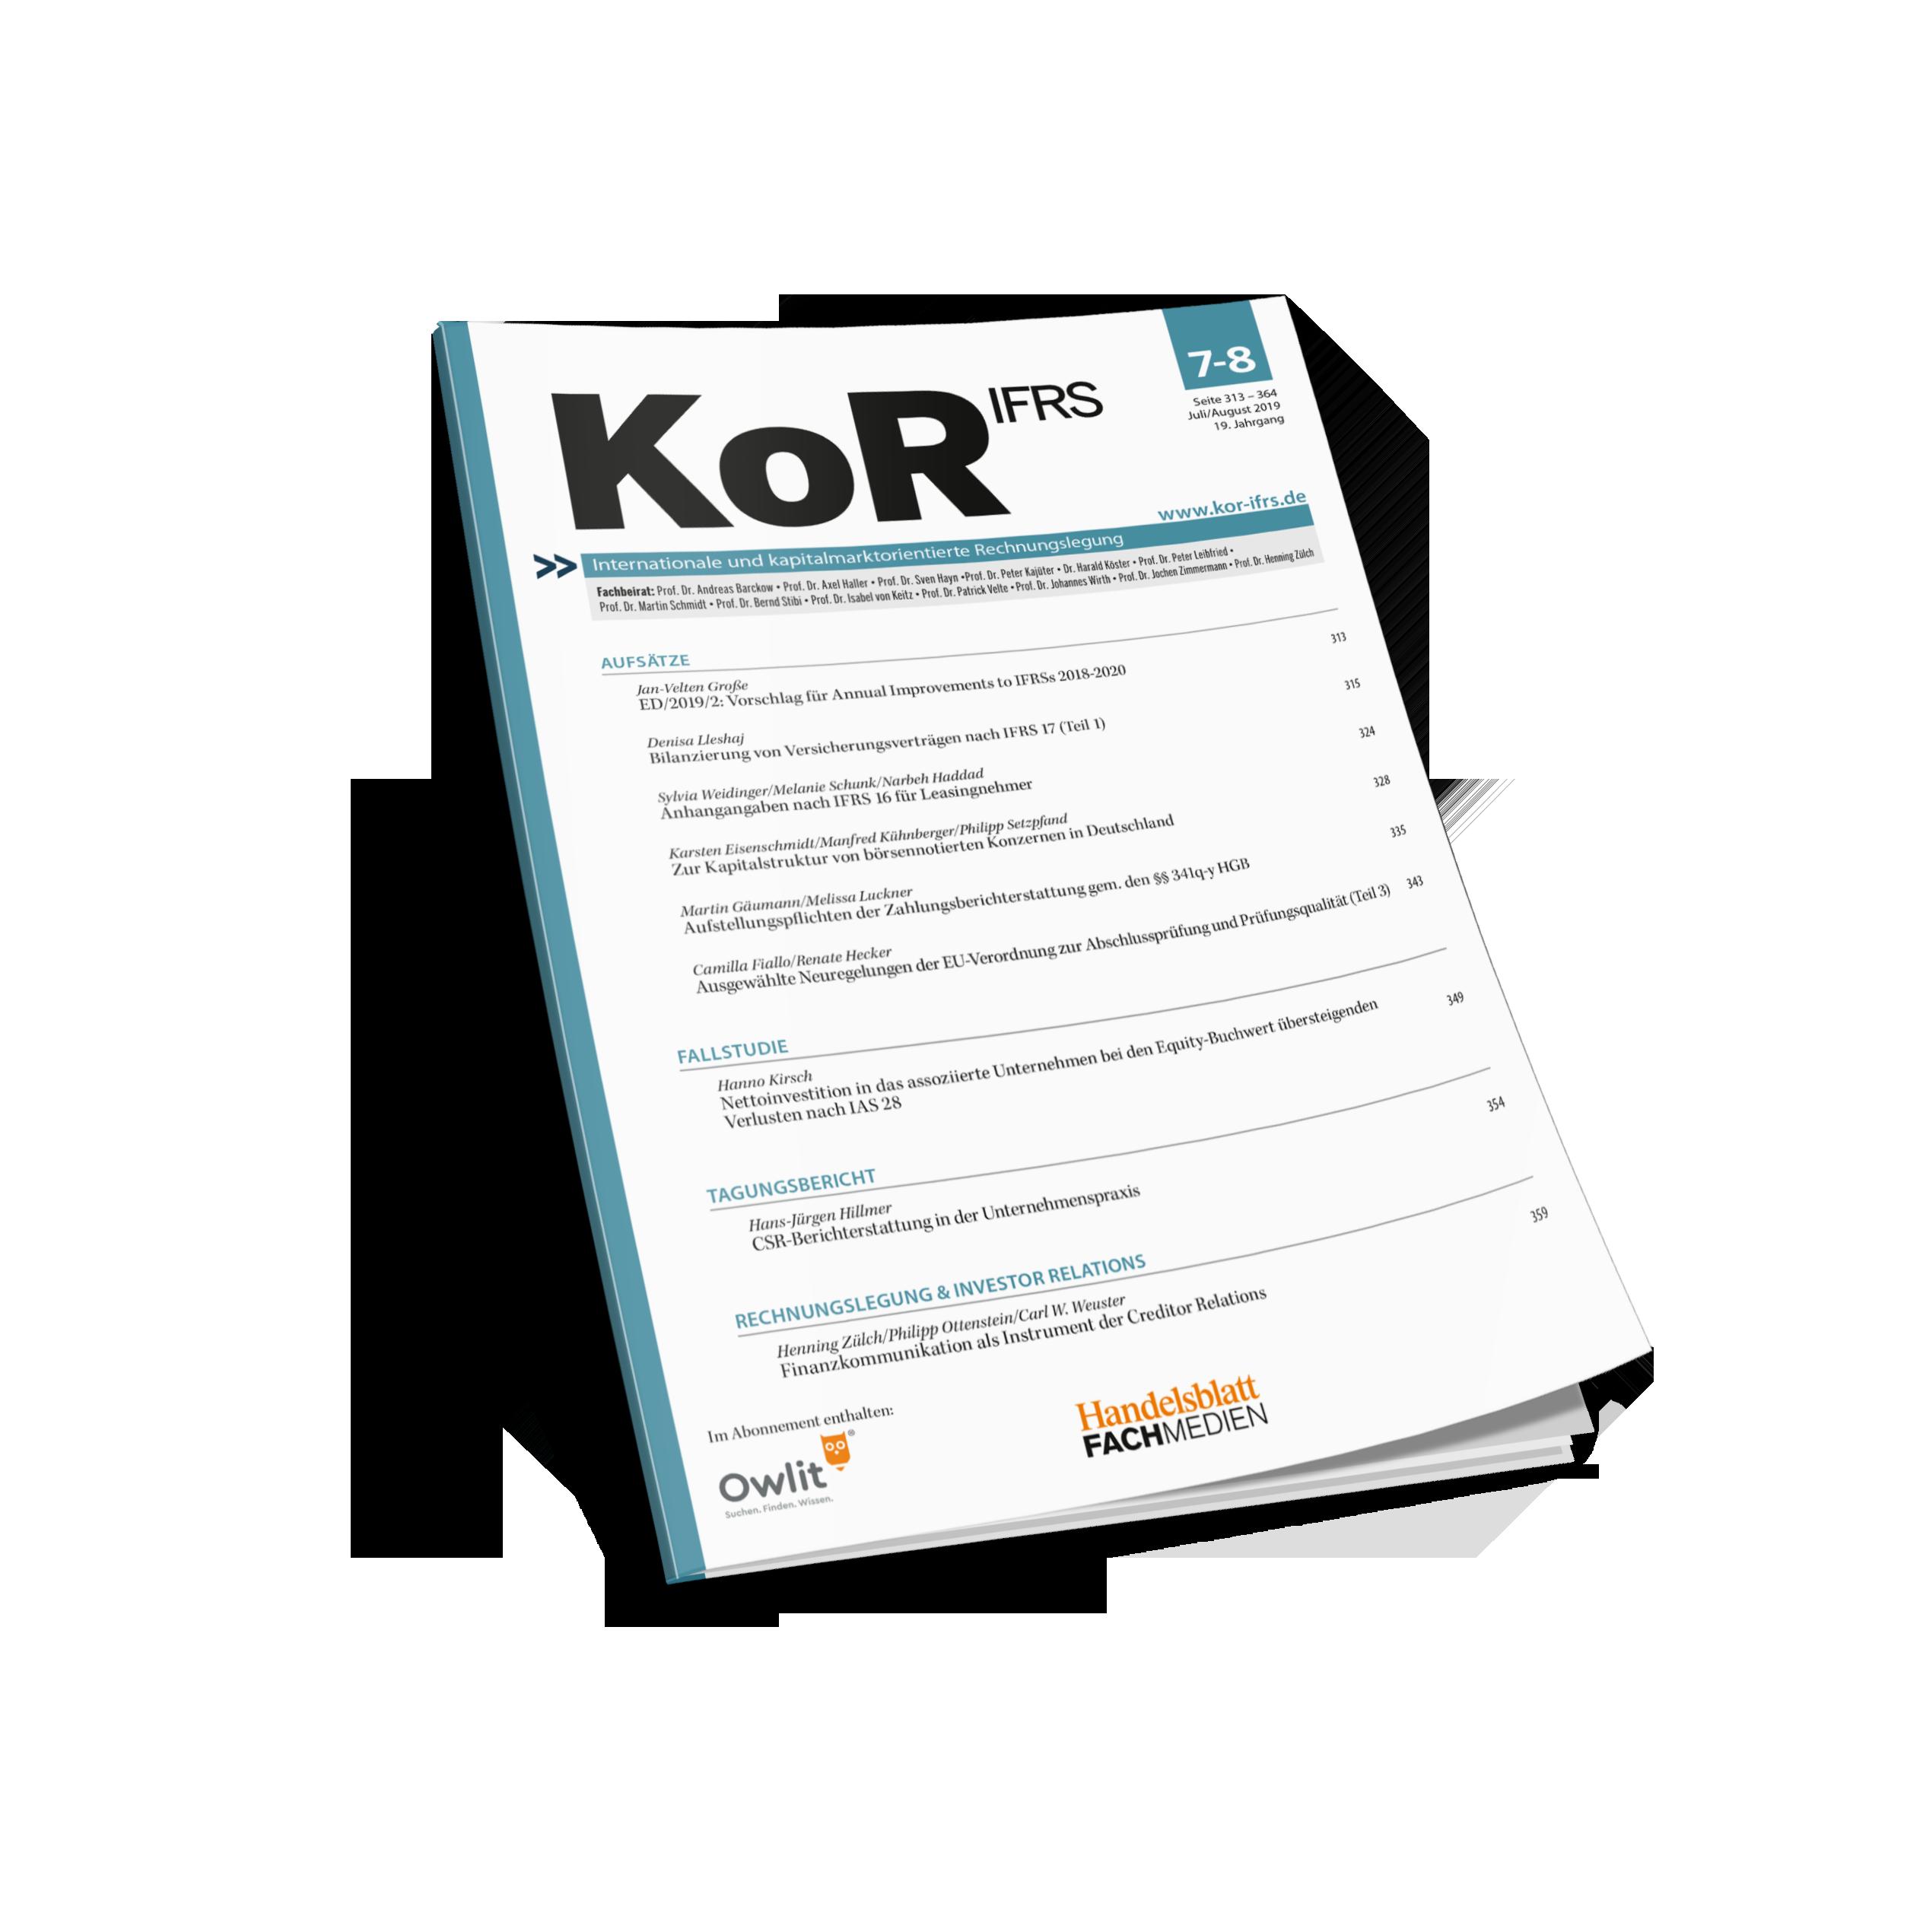 KoR IFRS